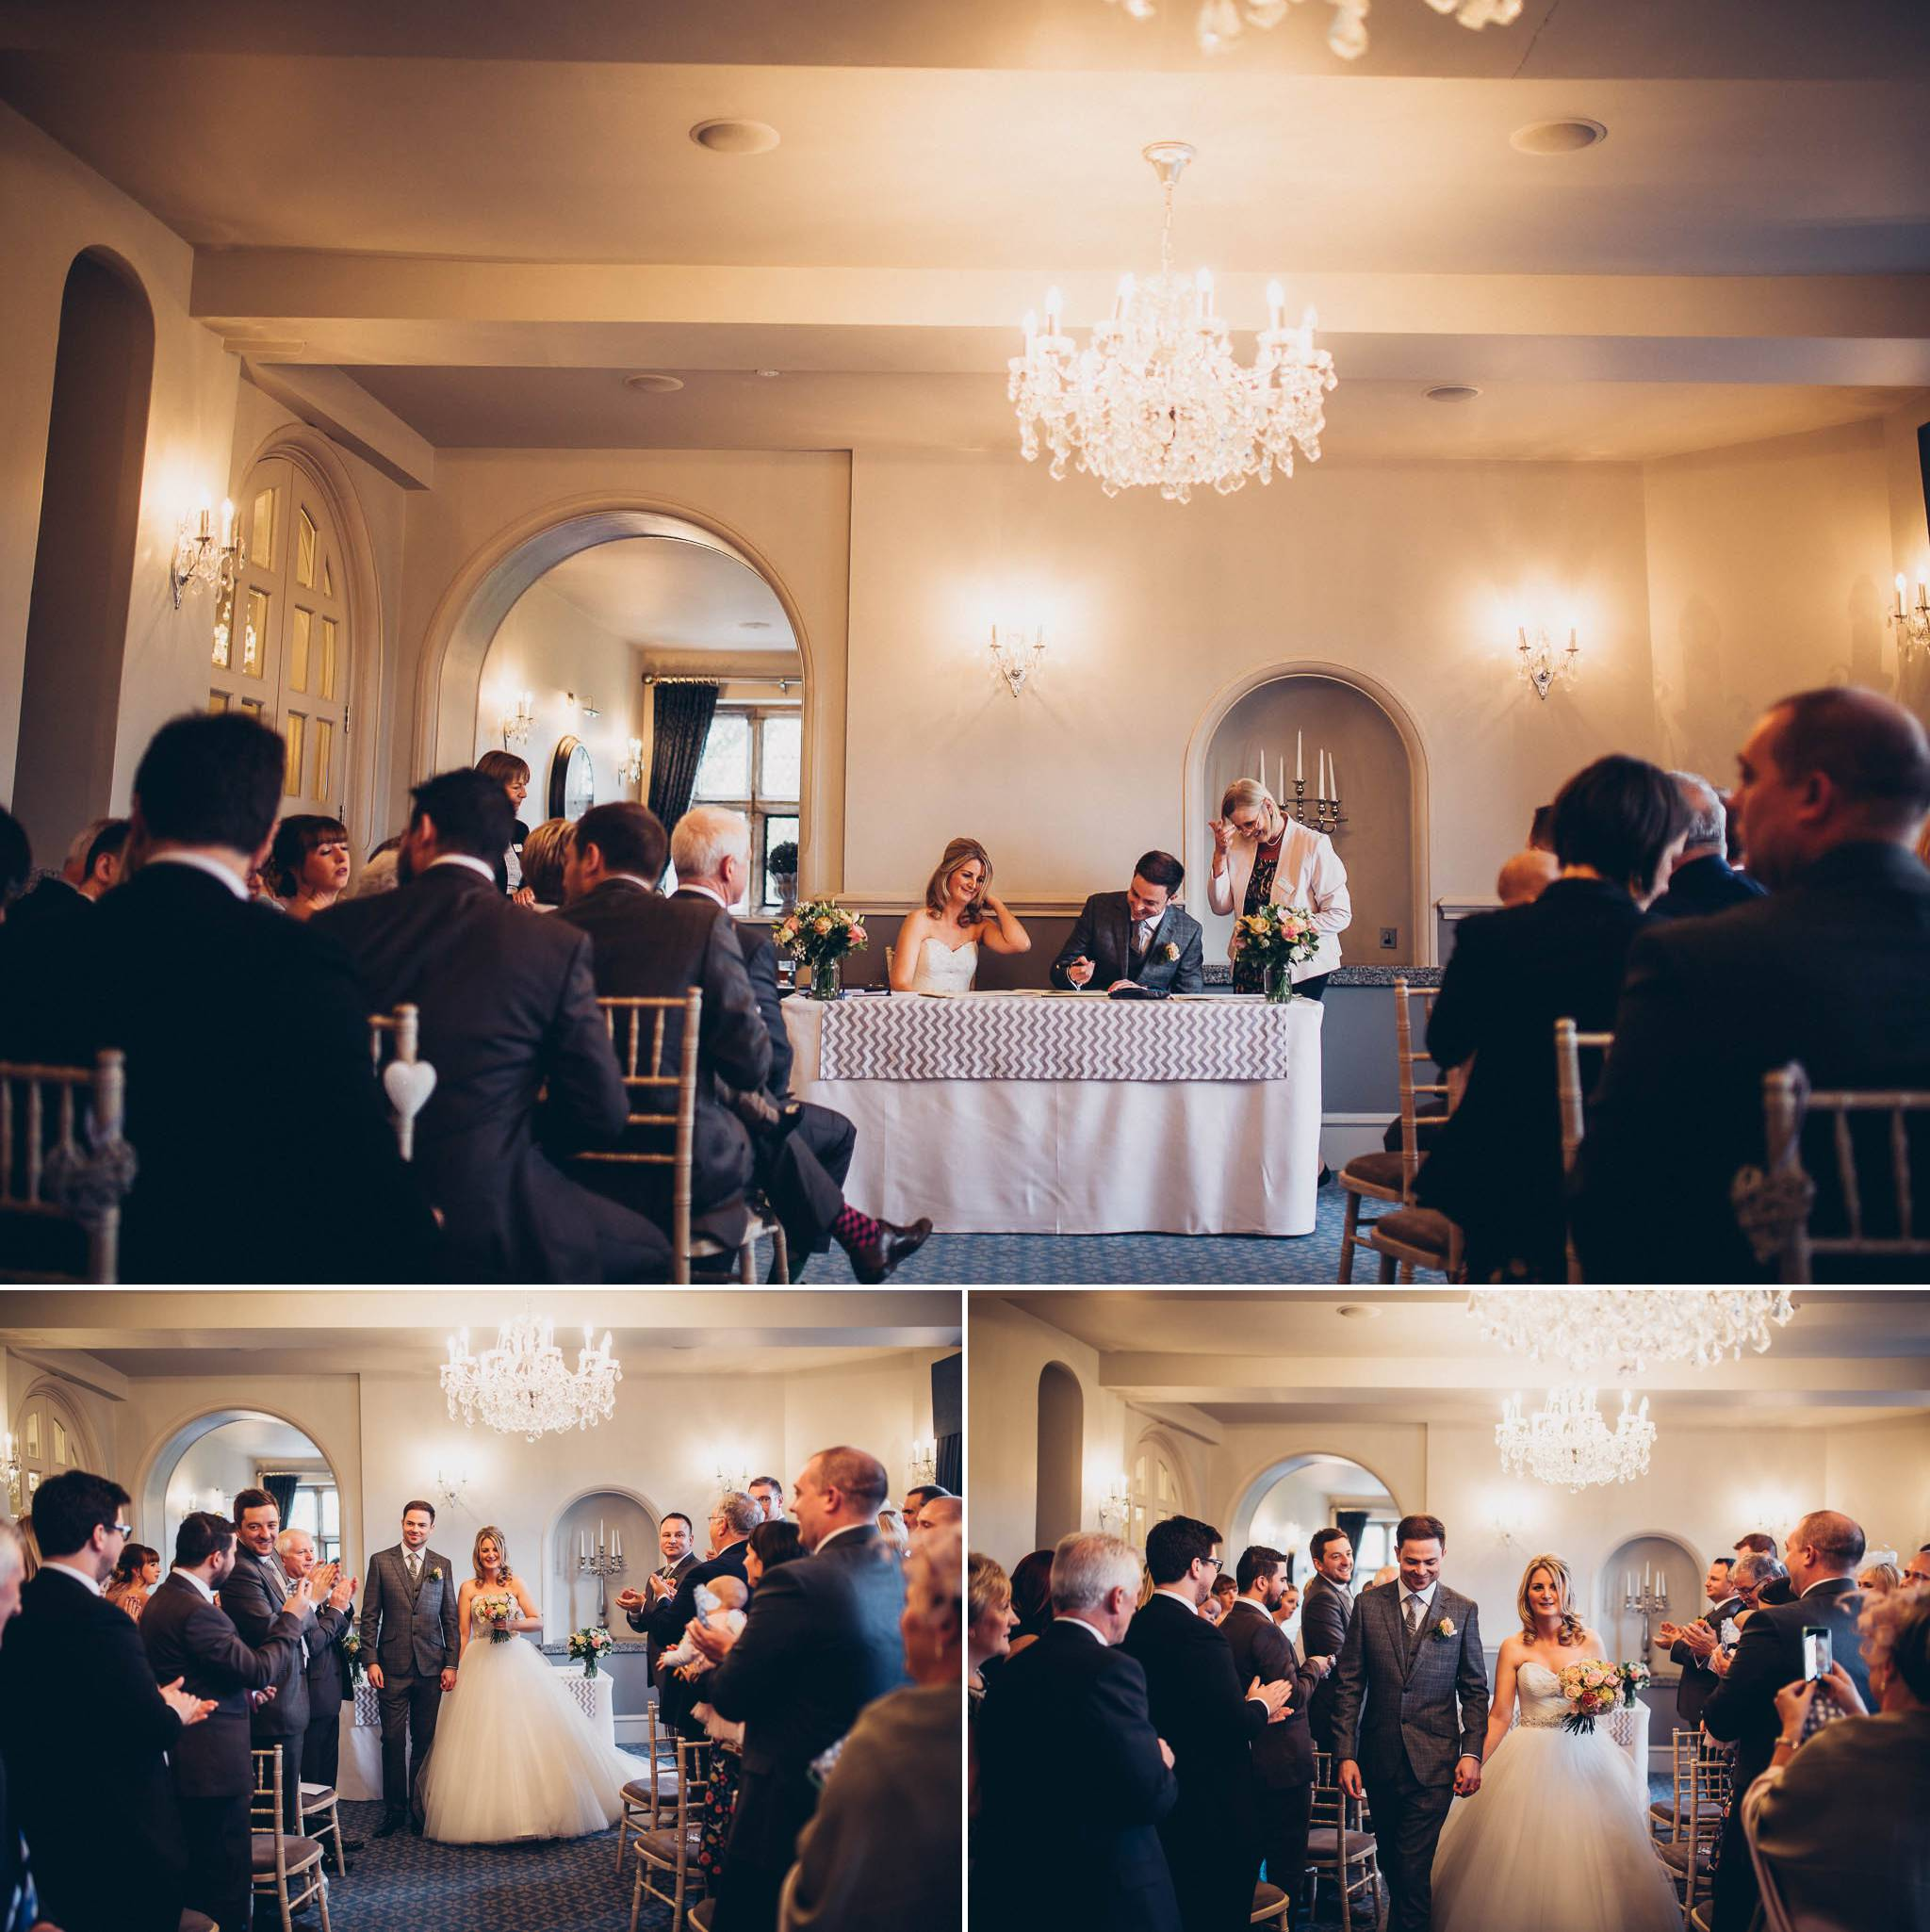 weston-hall-wedding-photographer 8.jpg